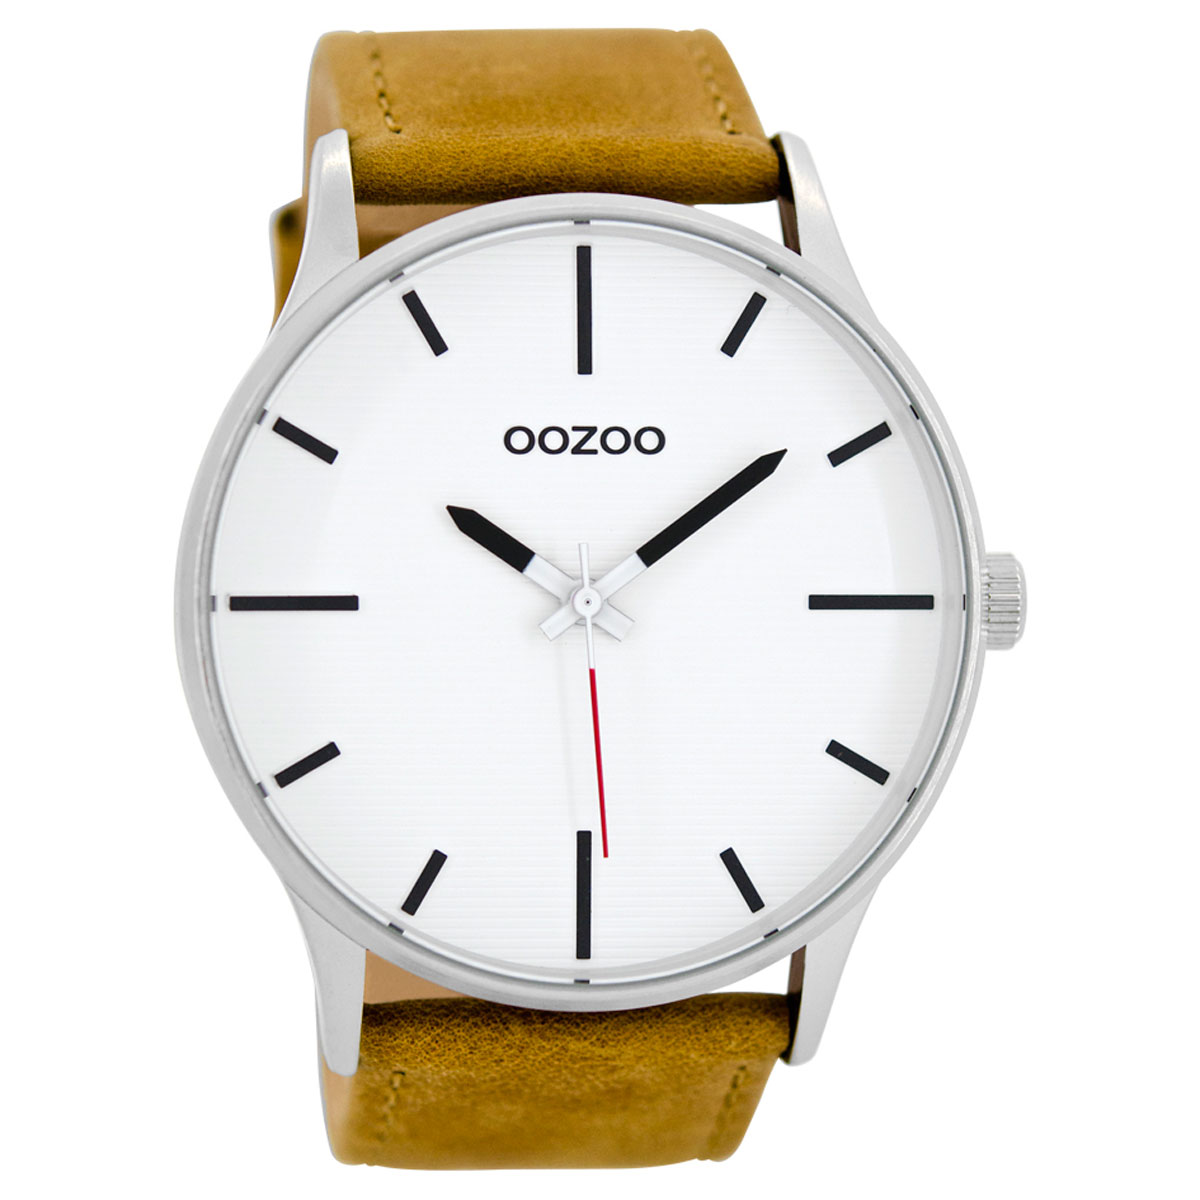 OOZOO Timepieces ανδρικό ρολόι XL με ασημί μεταλλική κάσα και καφέ  δερμάτινο λουράκι C8550 452fabdf169